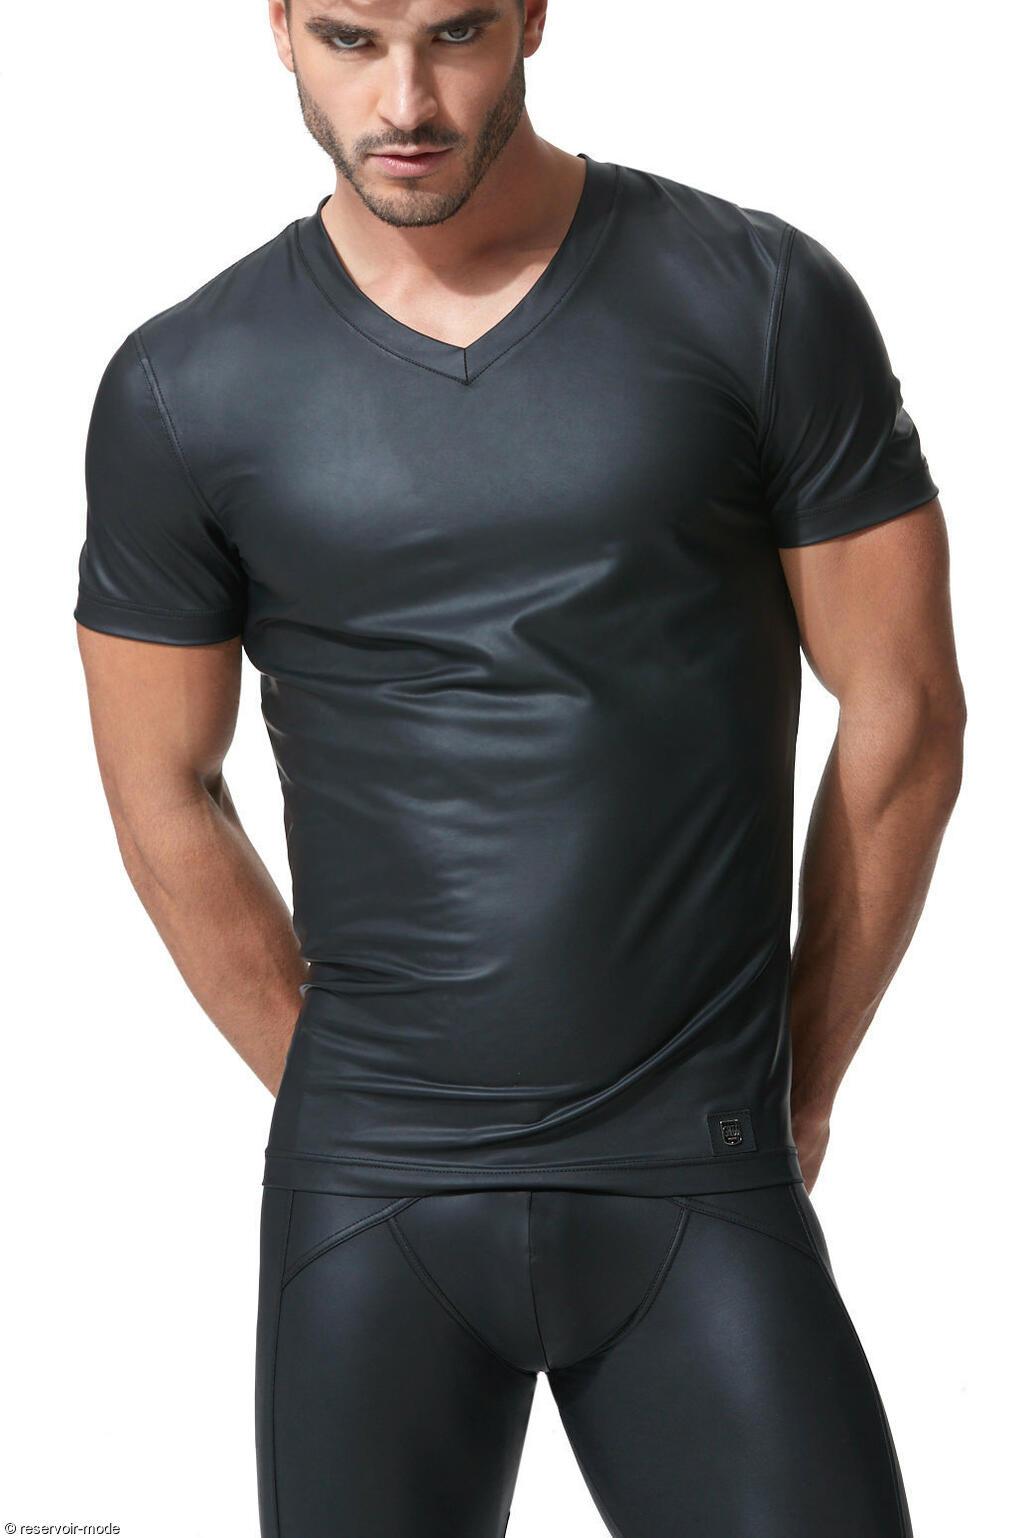 Femme T Gregg Crave Ei9d2wh Et Shirt Mode Col Réservoir Lingerie V Homme nOkP08w